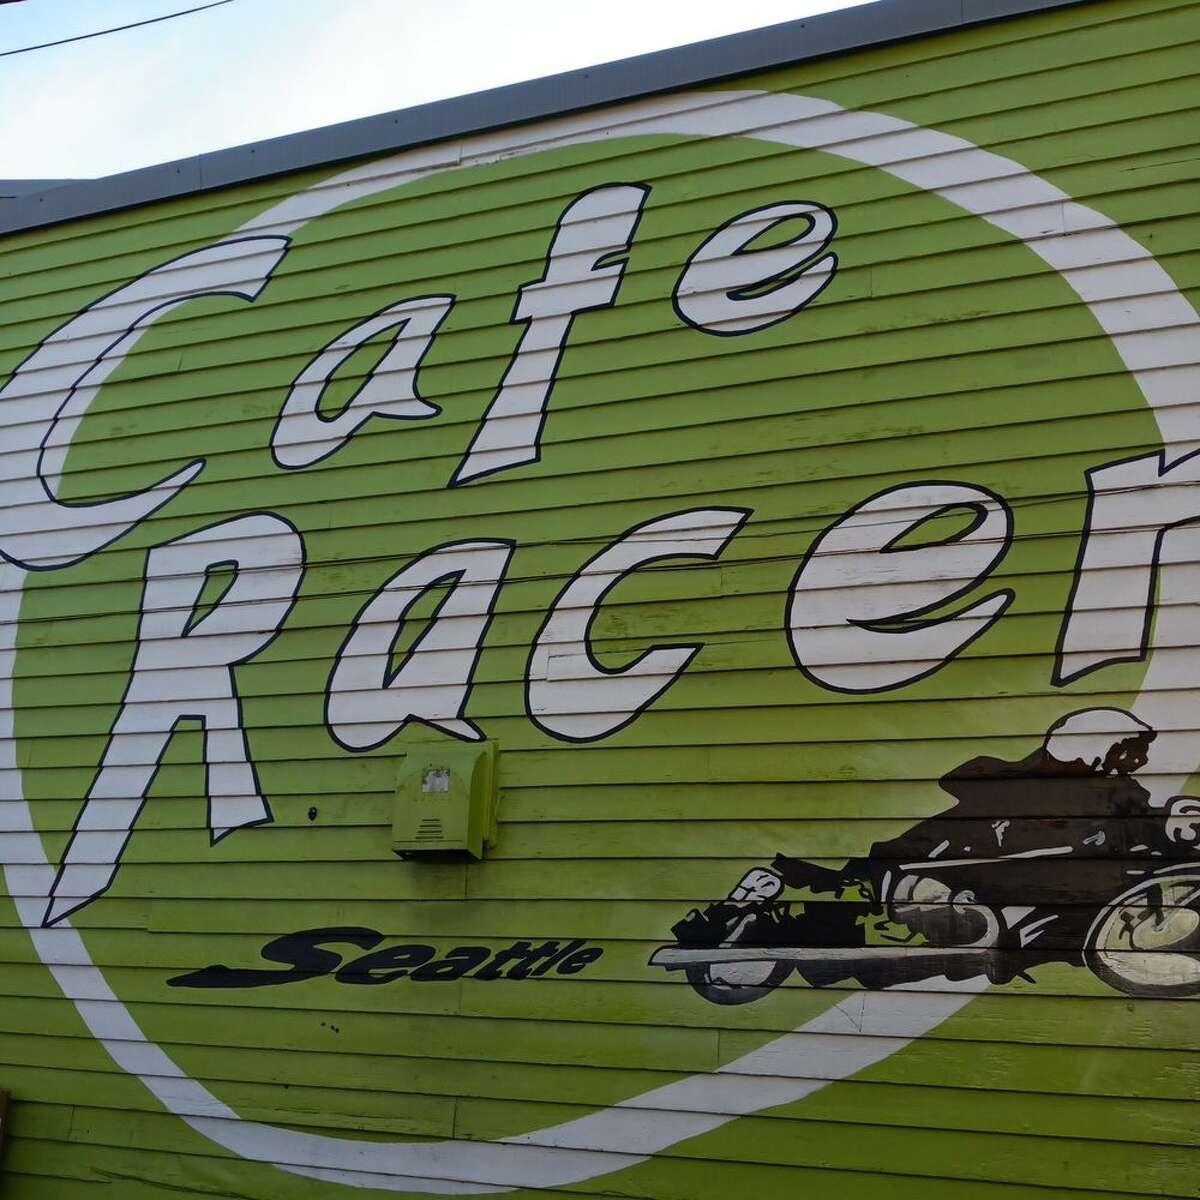 Cafe Racer - January 26, 2019